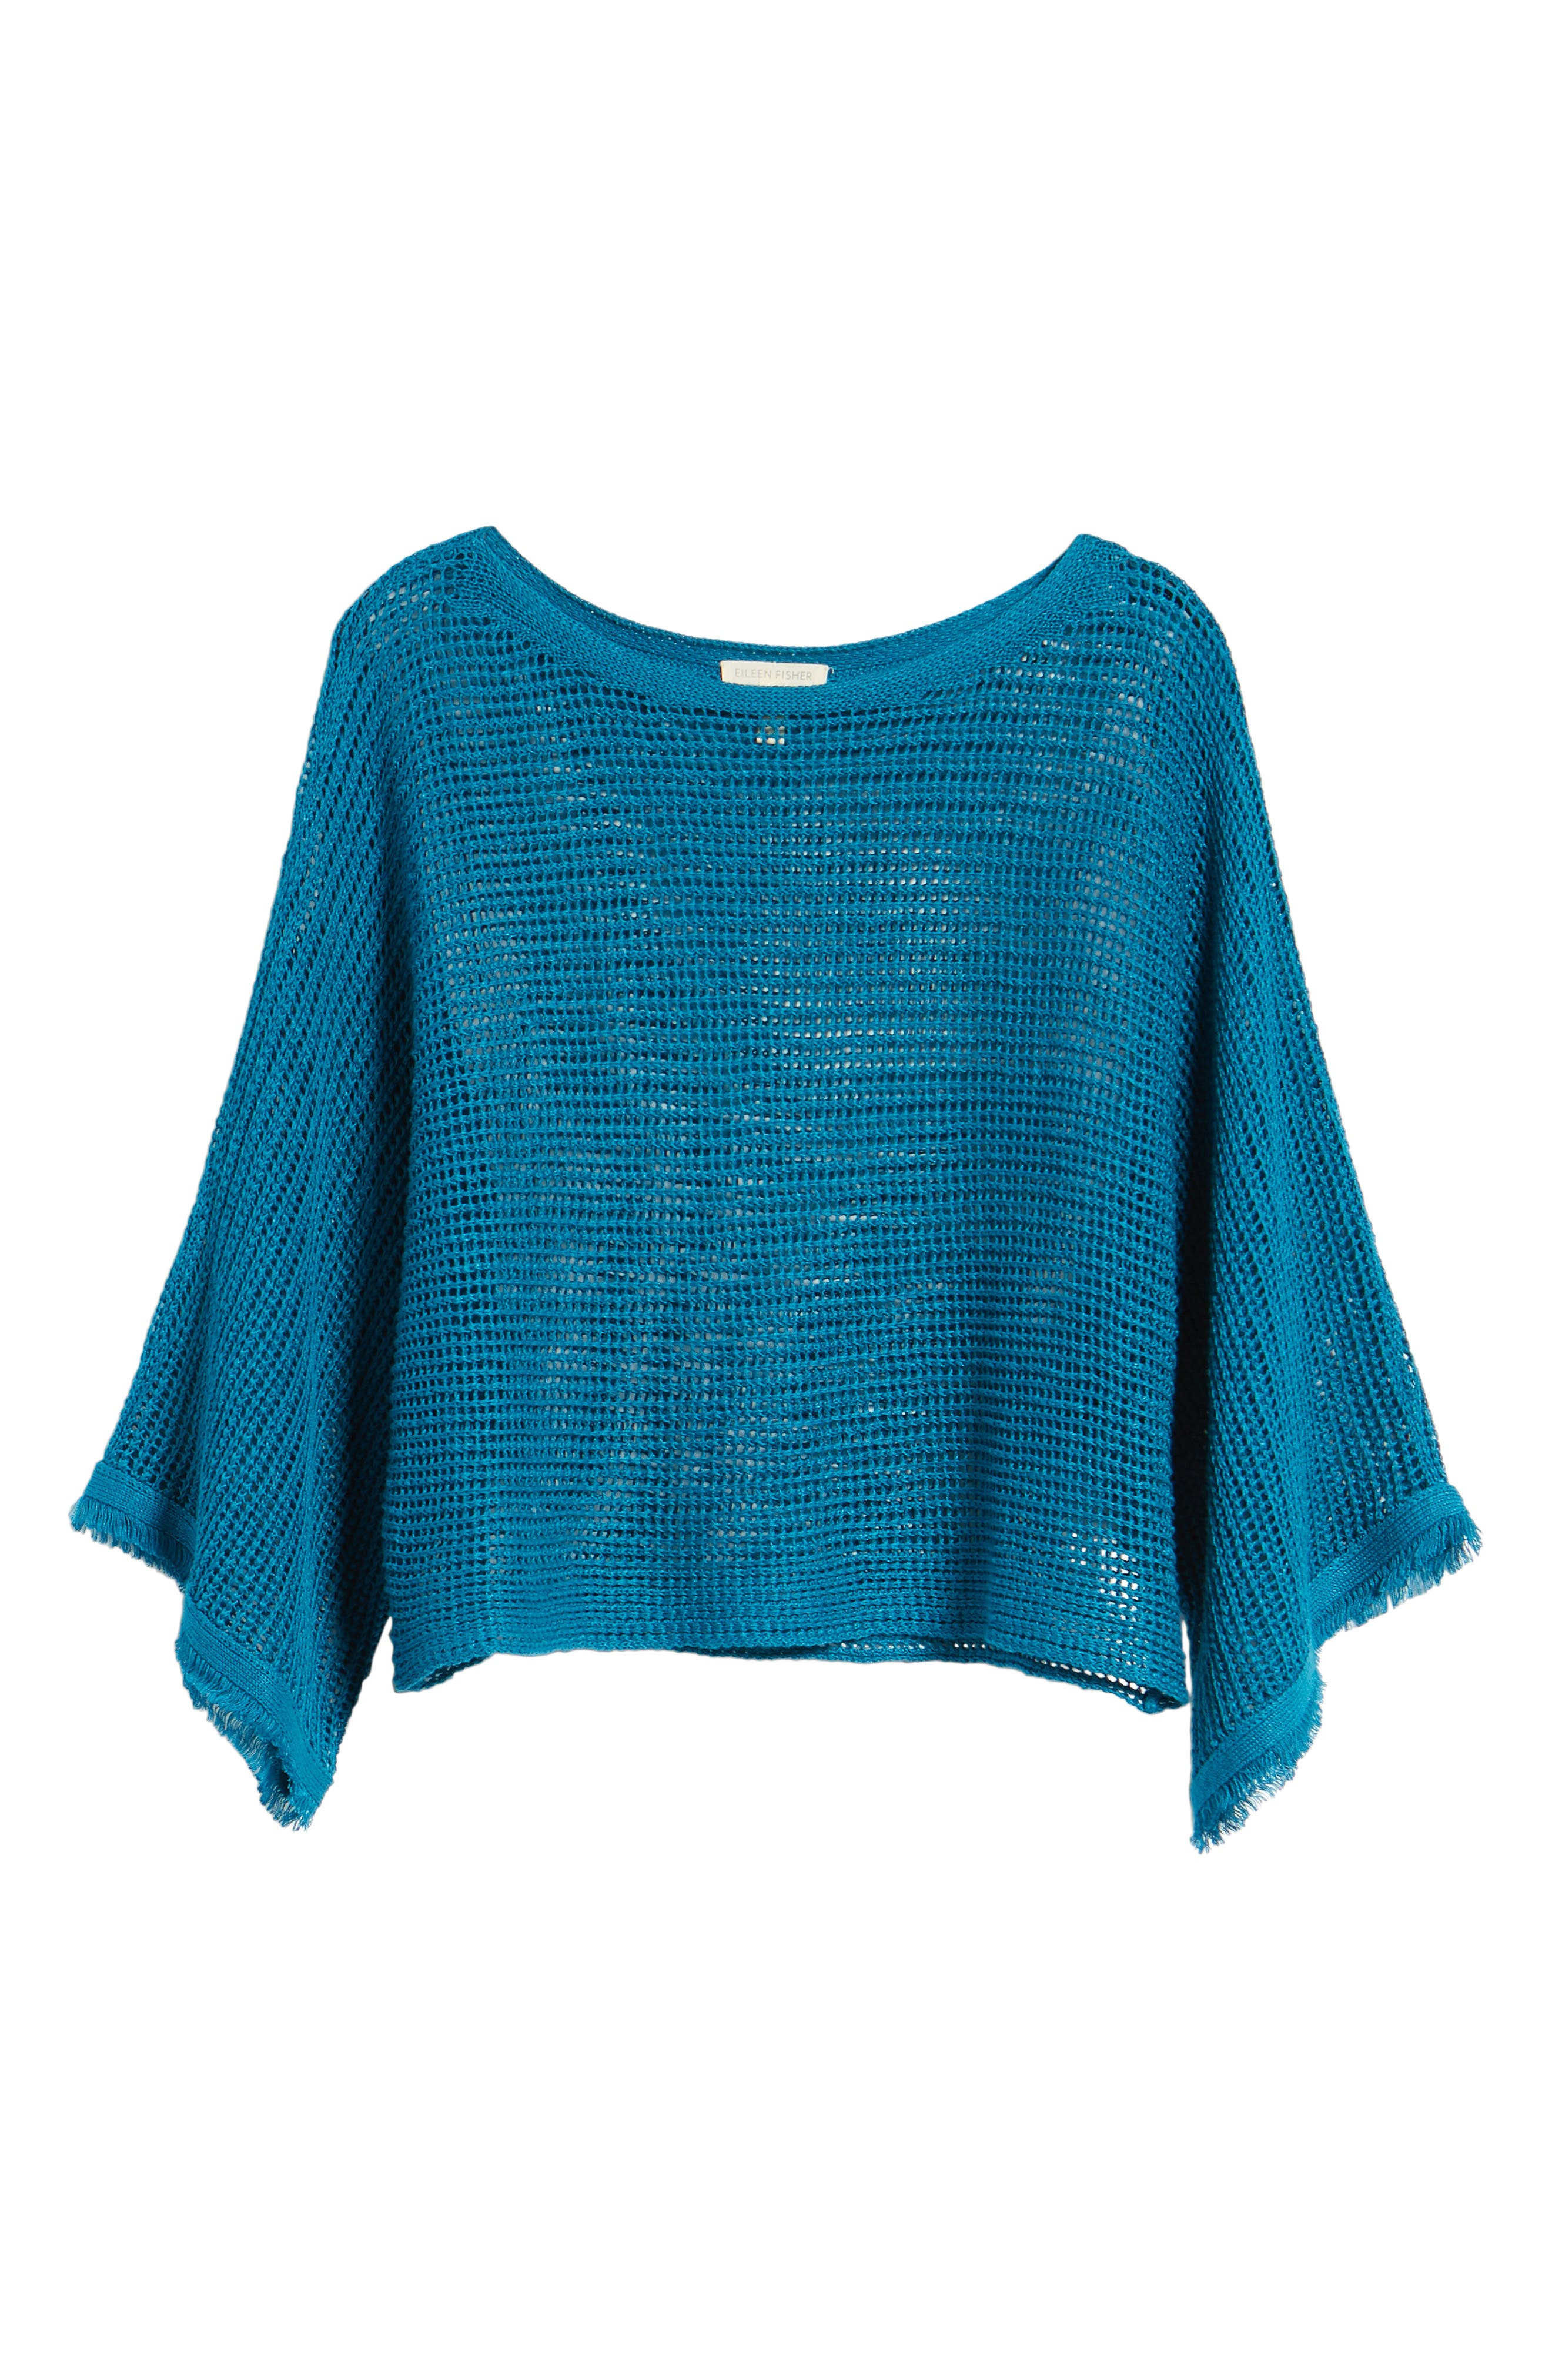 Organic Linen Short Sweater,                             Alternate thumbnail 7, color,                             Jewel